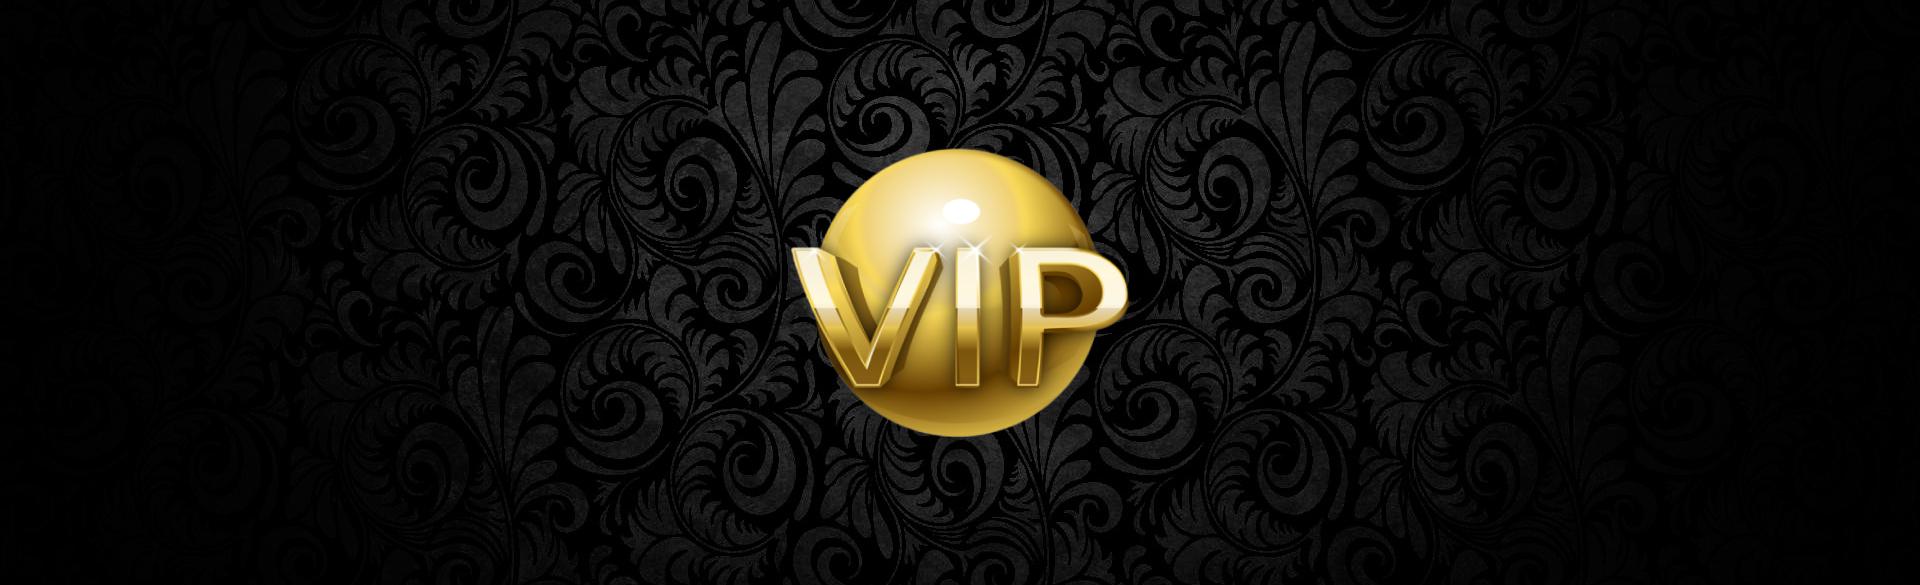 VIP Exclusive Bonuses: Loyalty in Online Casinos